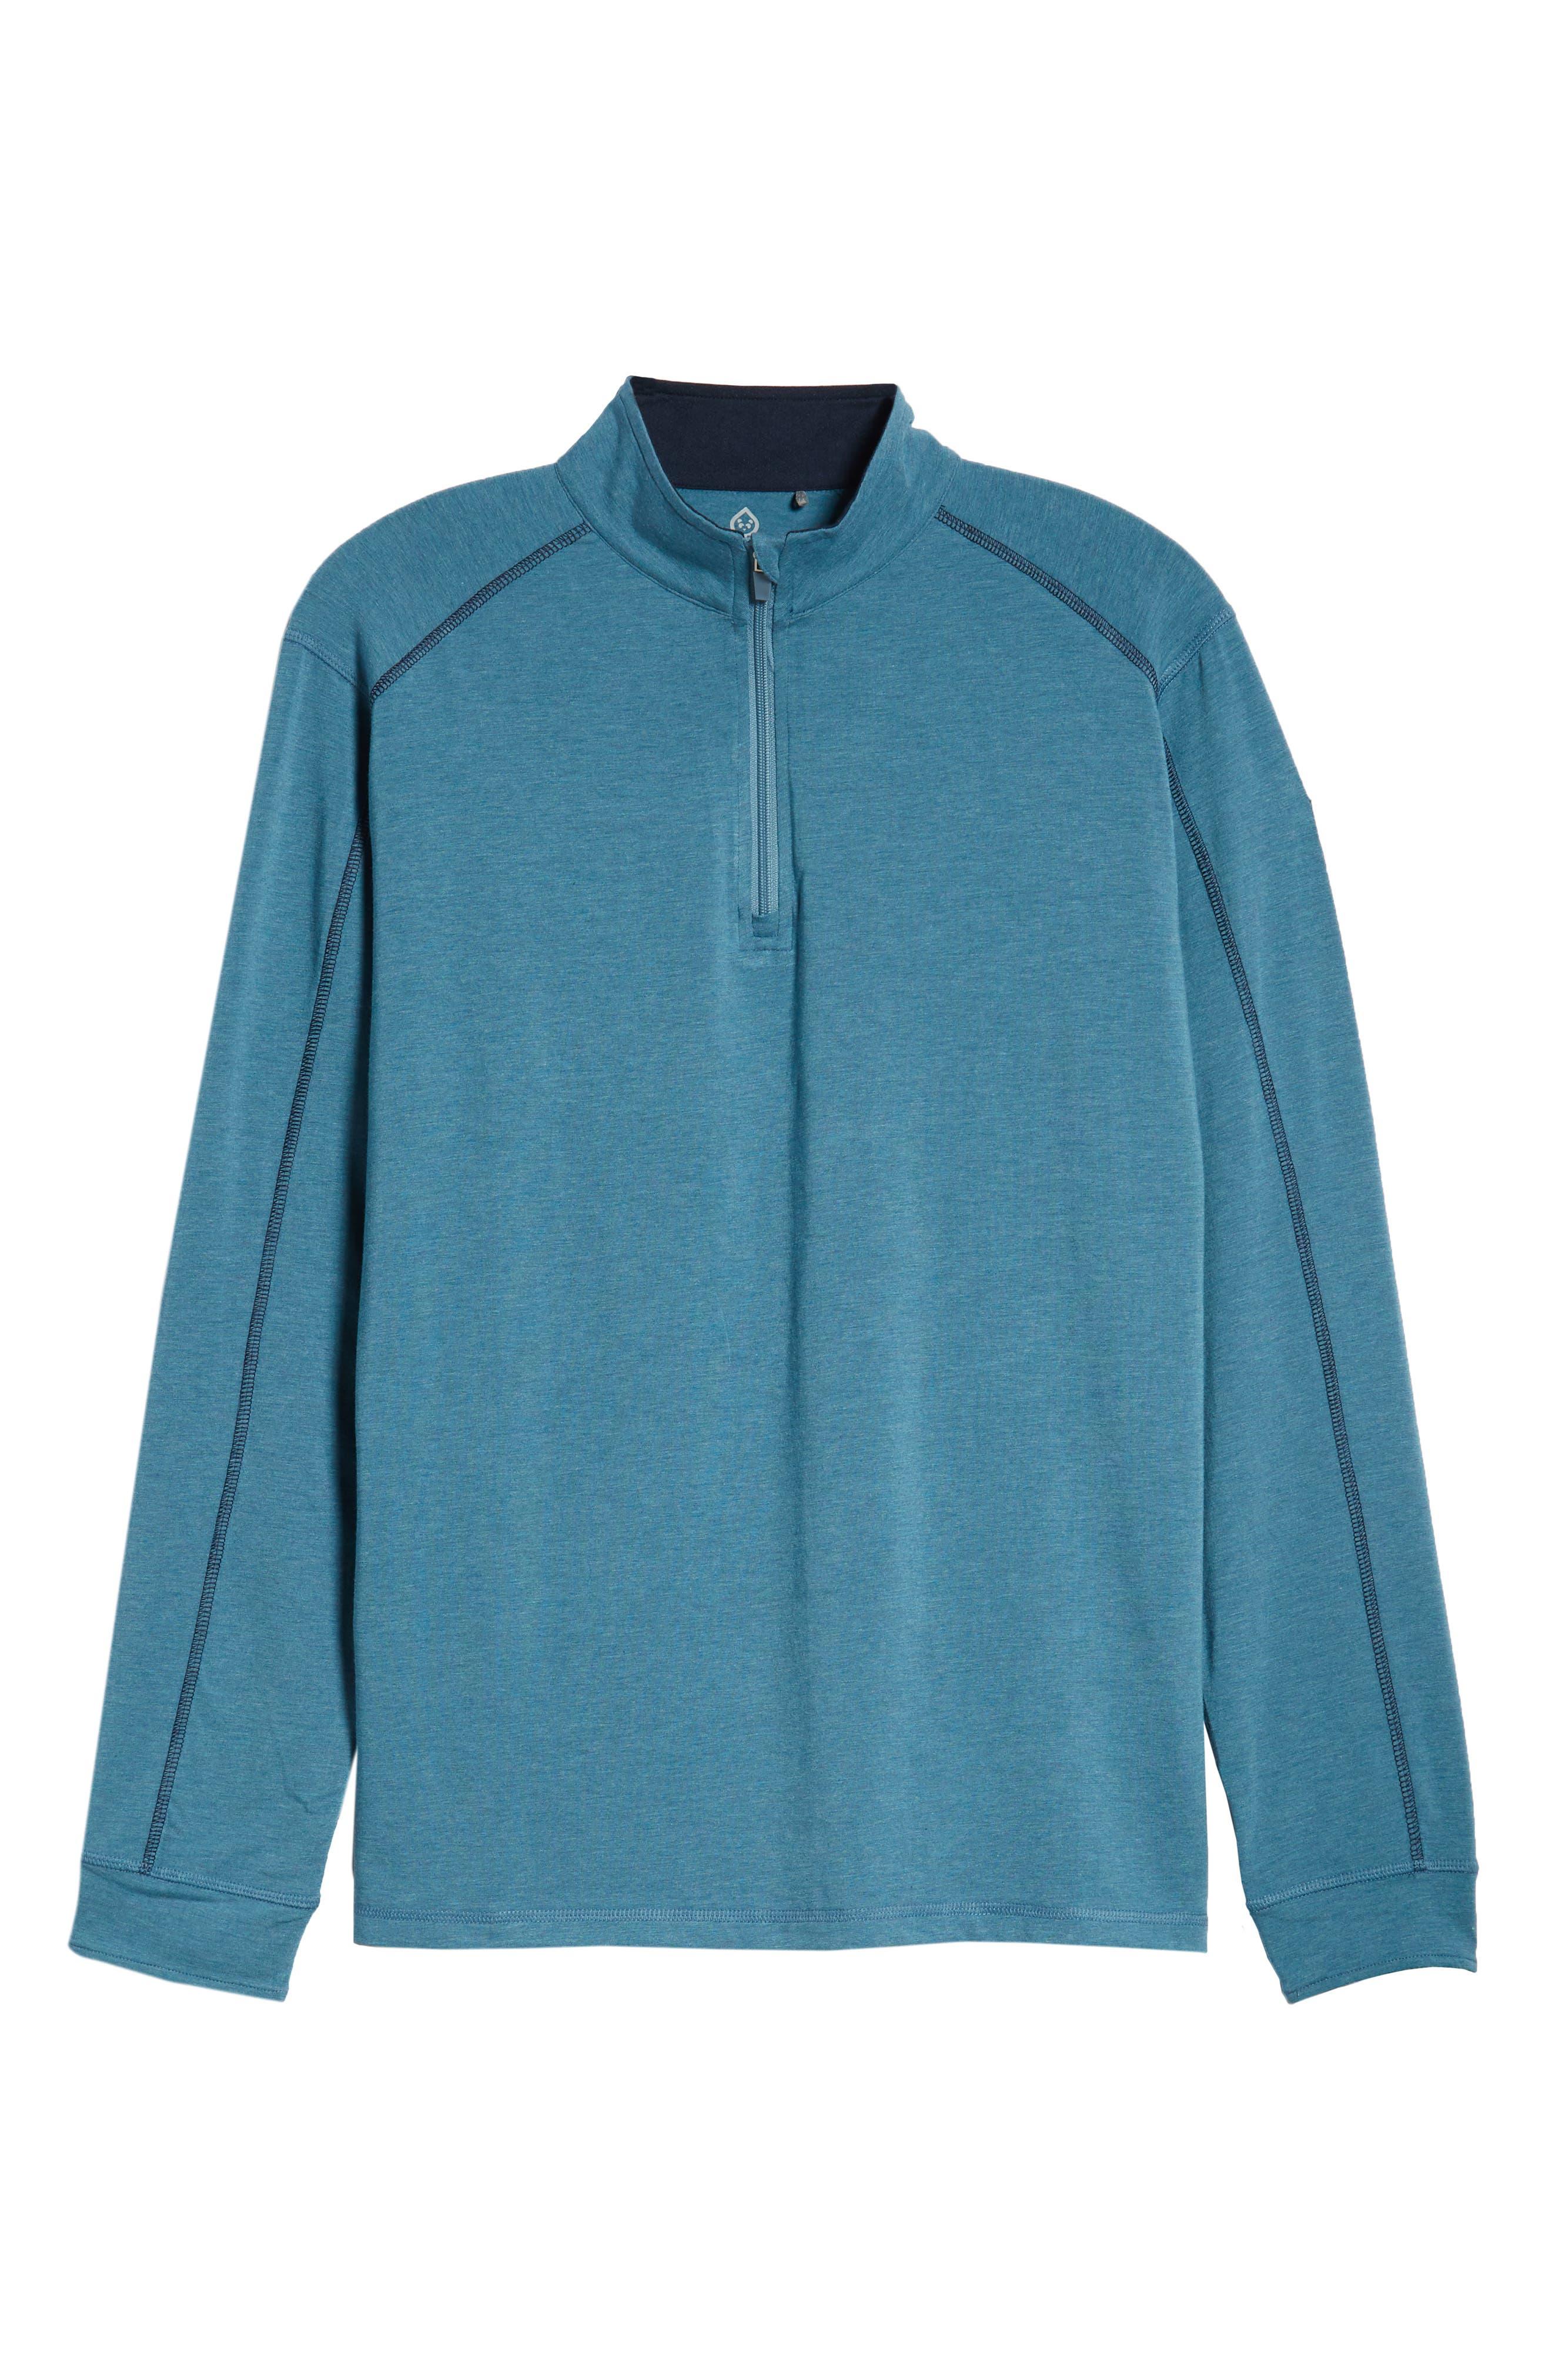 Carrollton Quarter Zip Sweatshirt,                             Main thumbnail 1, color,                             Tranquility Sea Heather